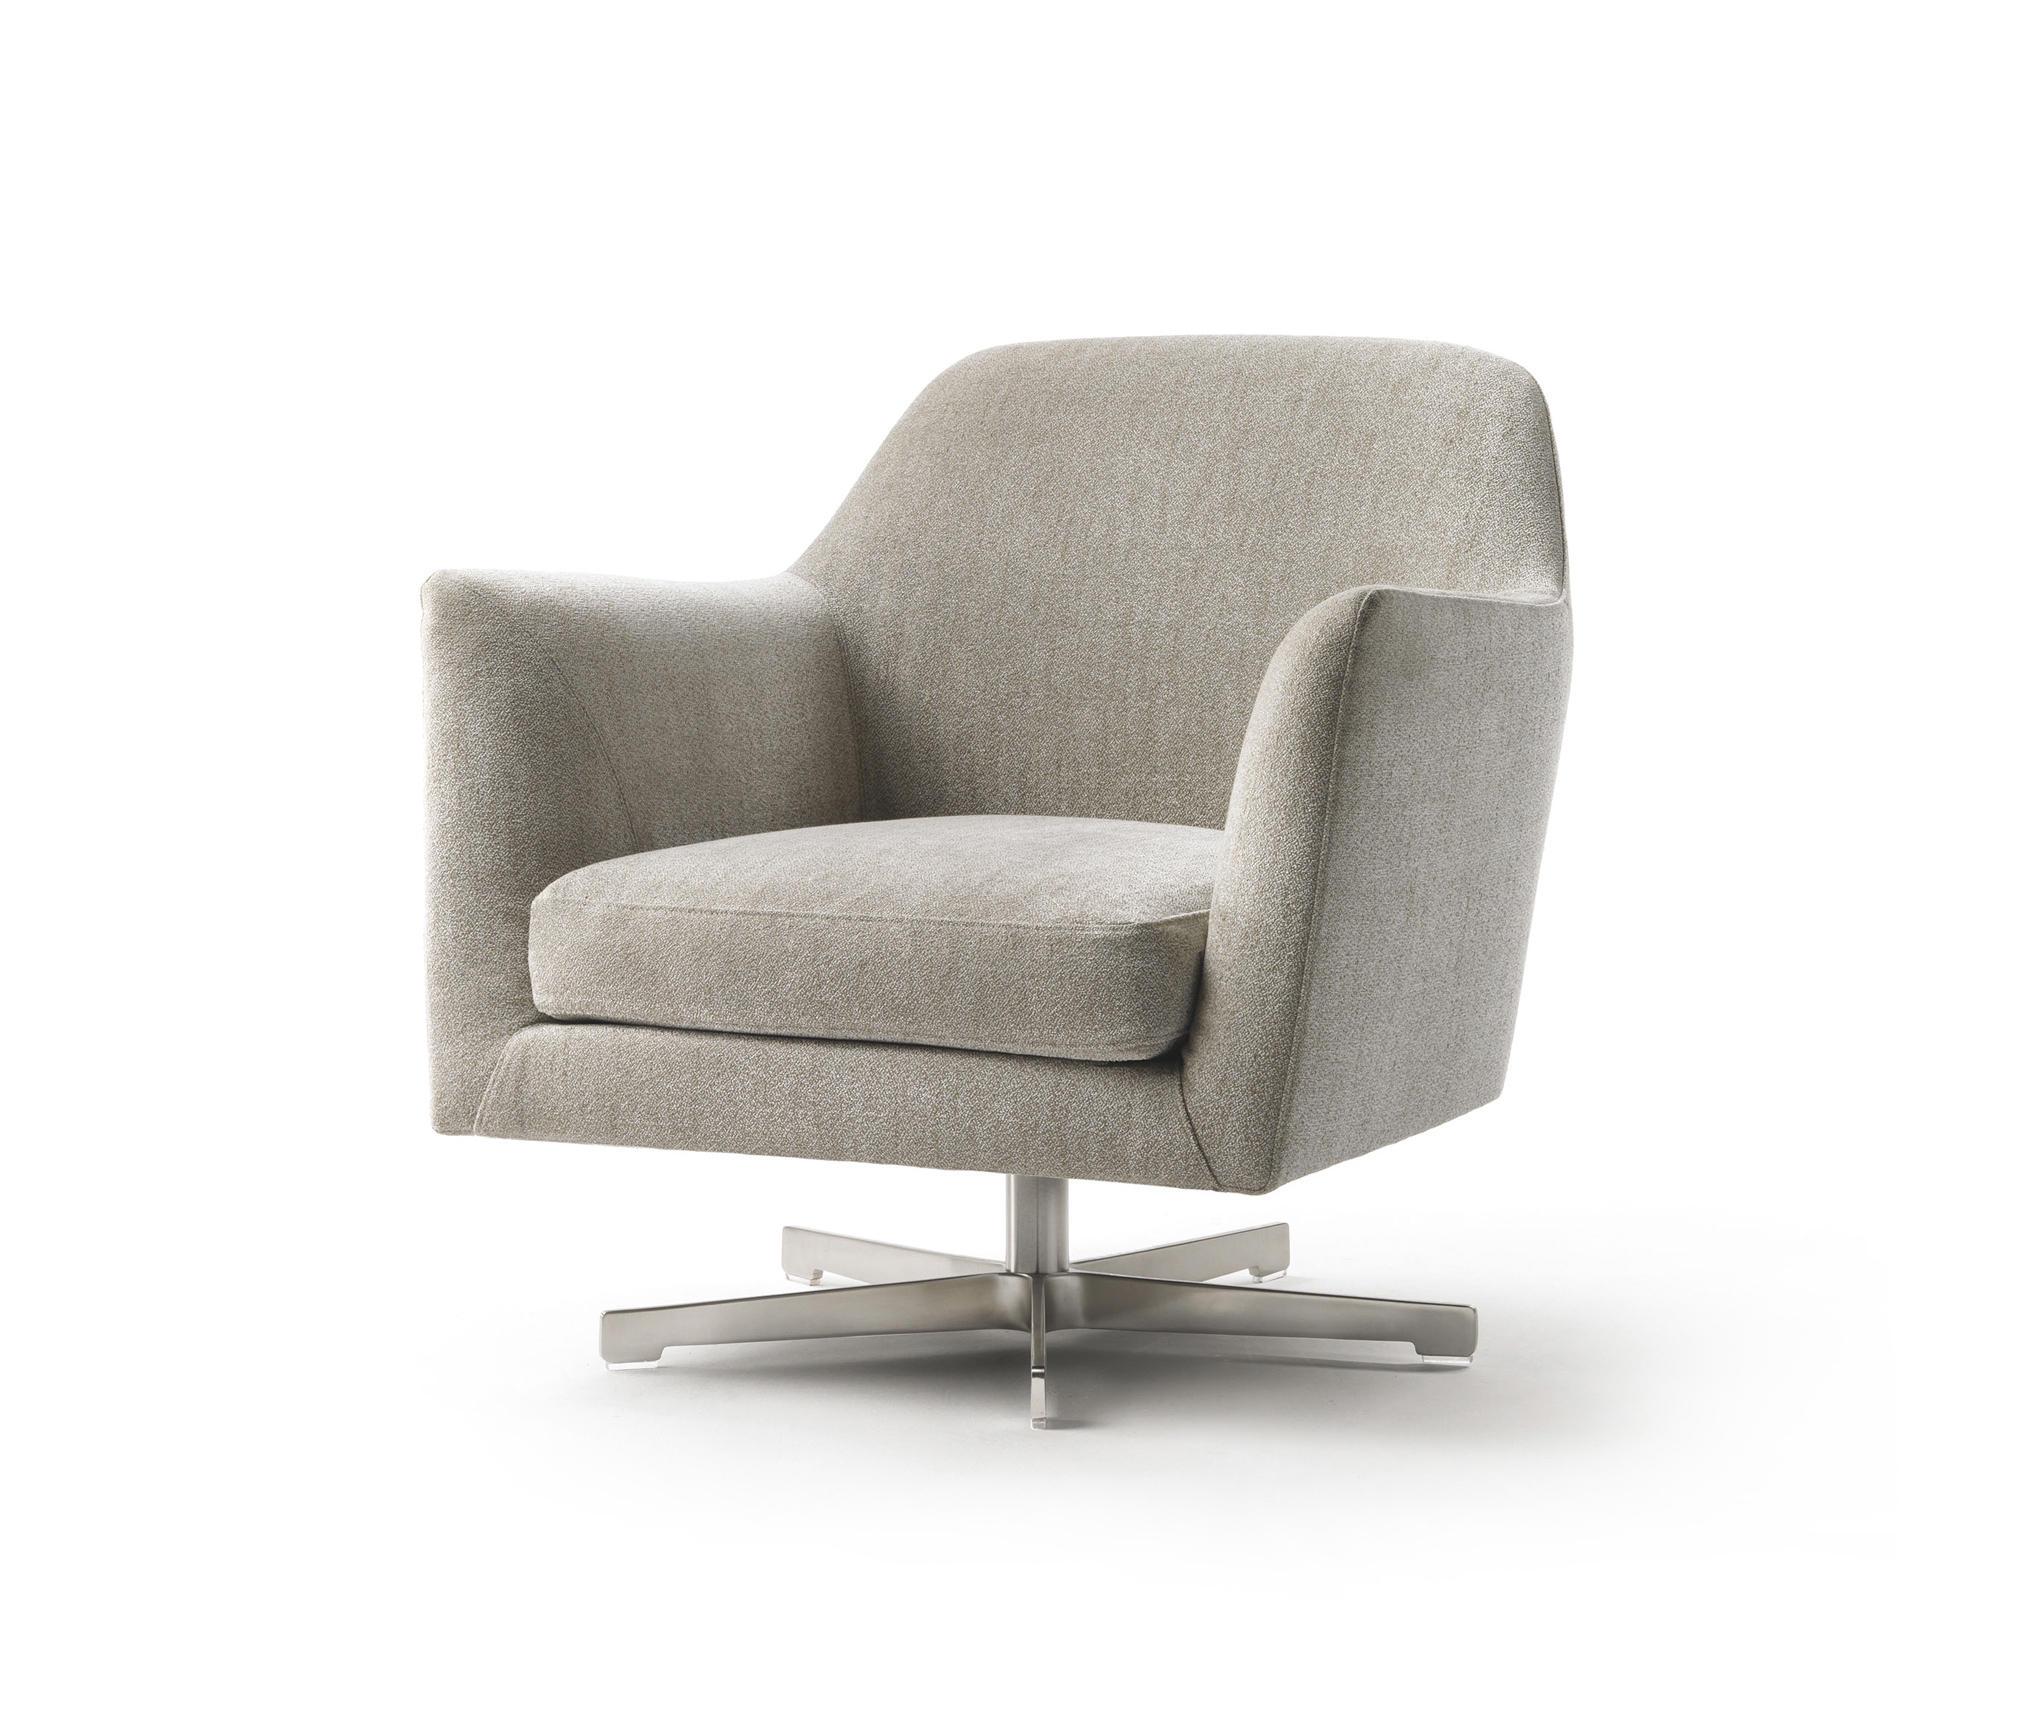 luce sessel drehbar loungesessel von flexform architonic. Black Bedroom Furniture Sets. Home Design Ideas